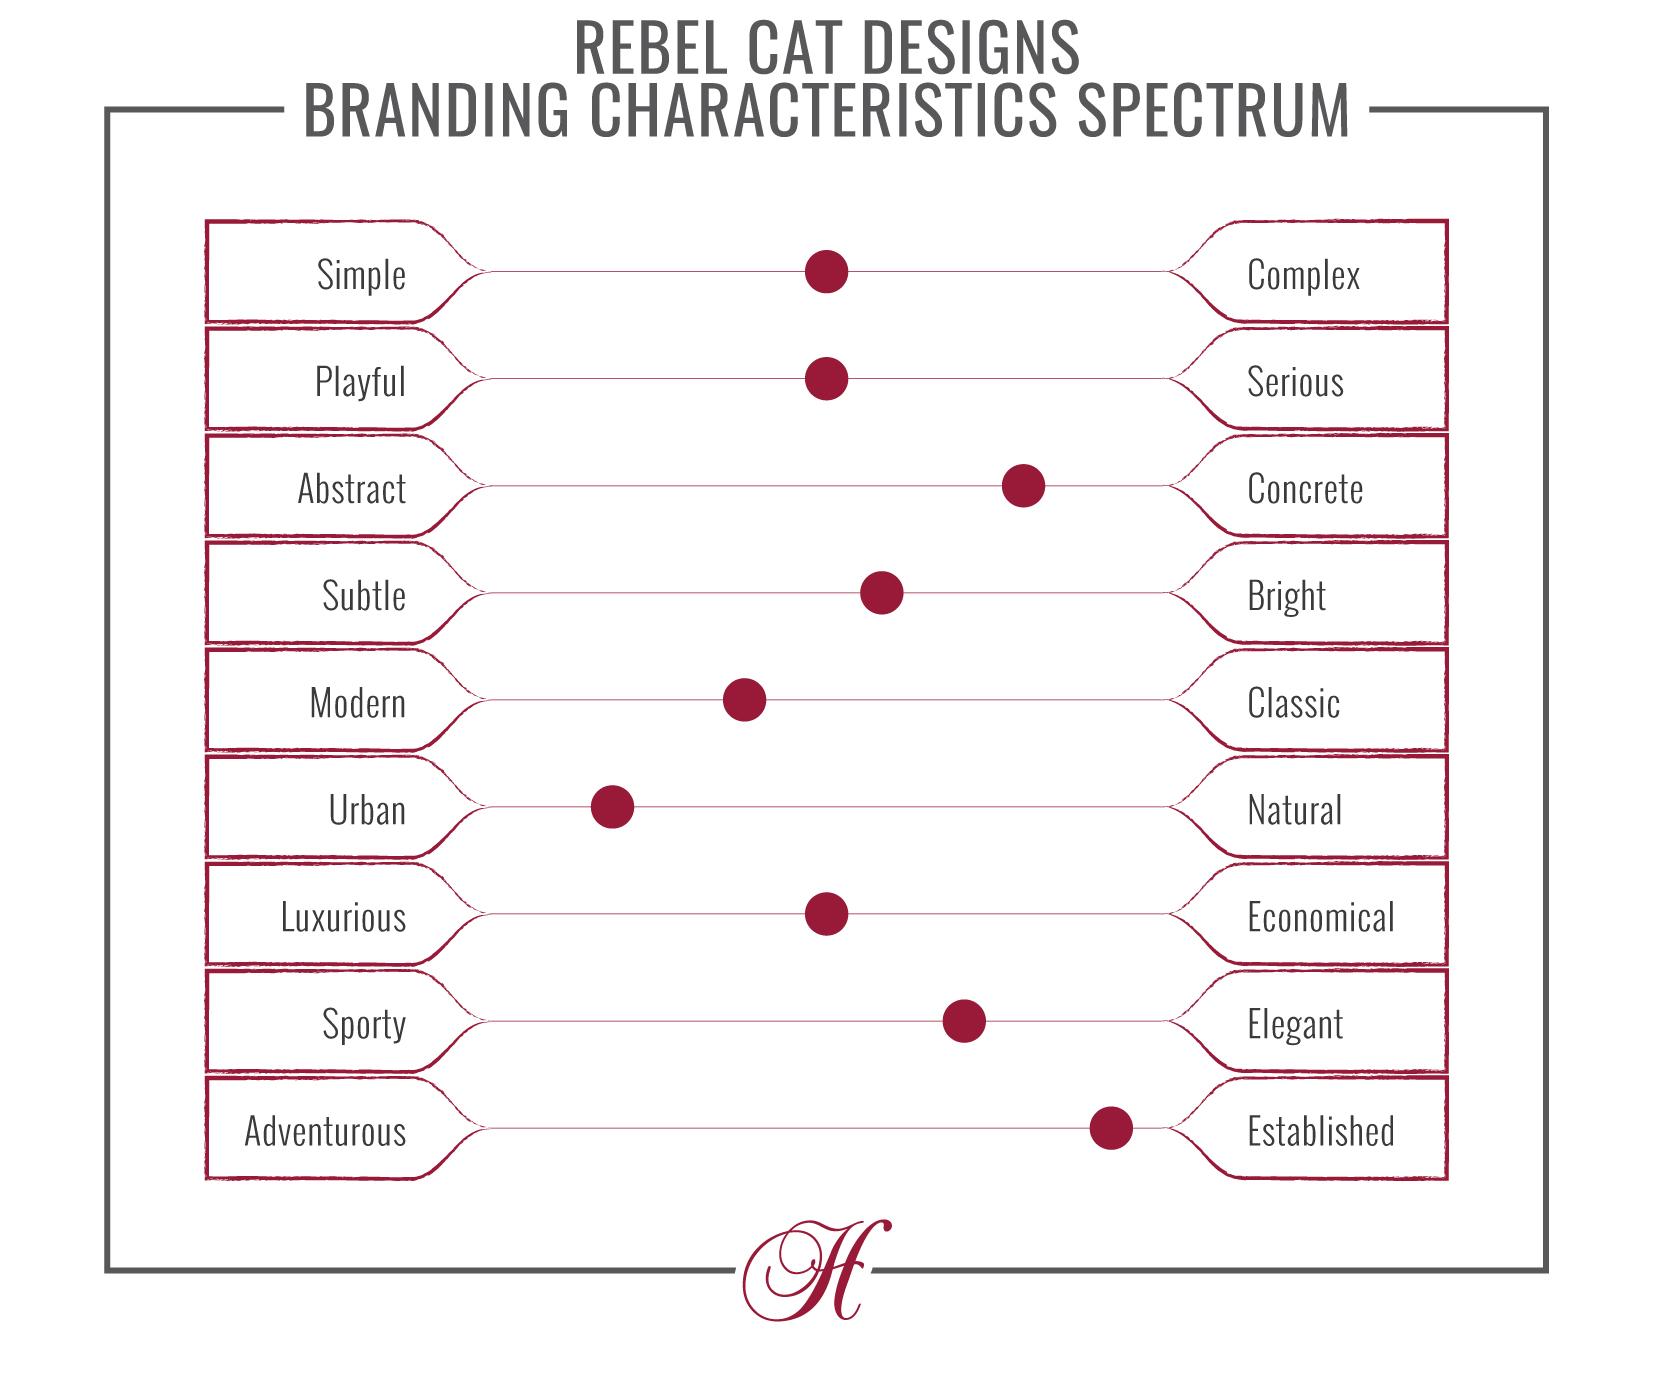 The Rebel Cat Designs Branding Characteristics Chart